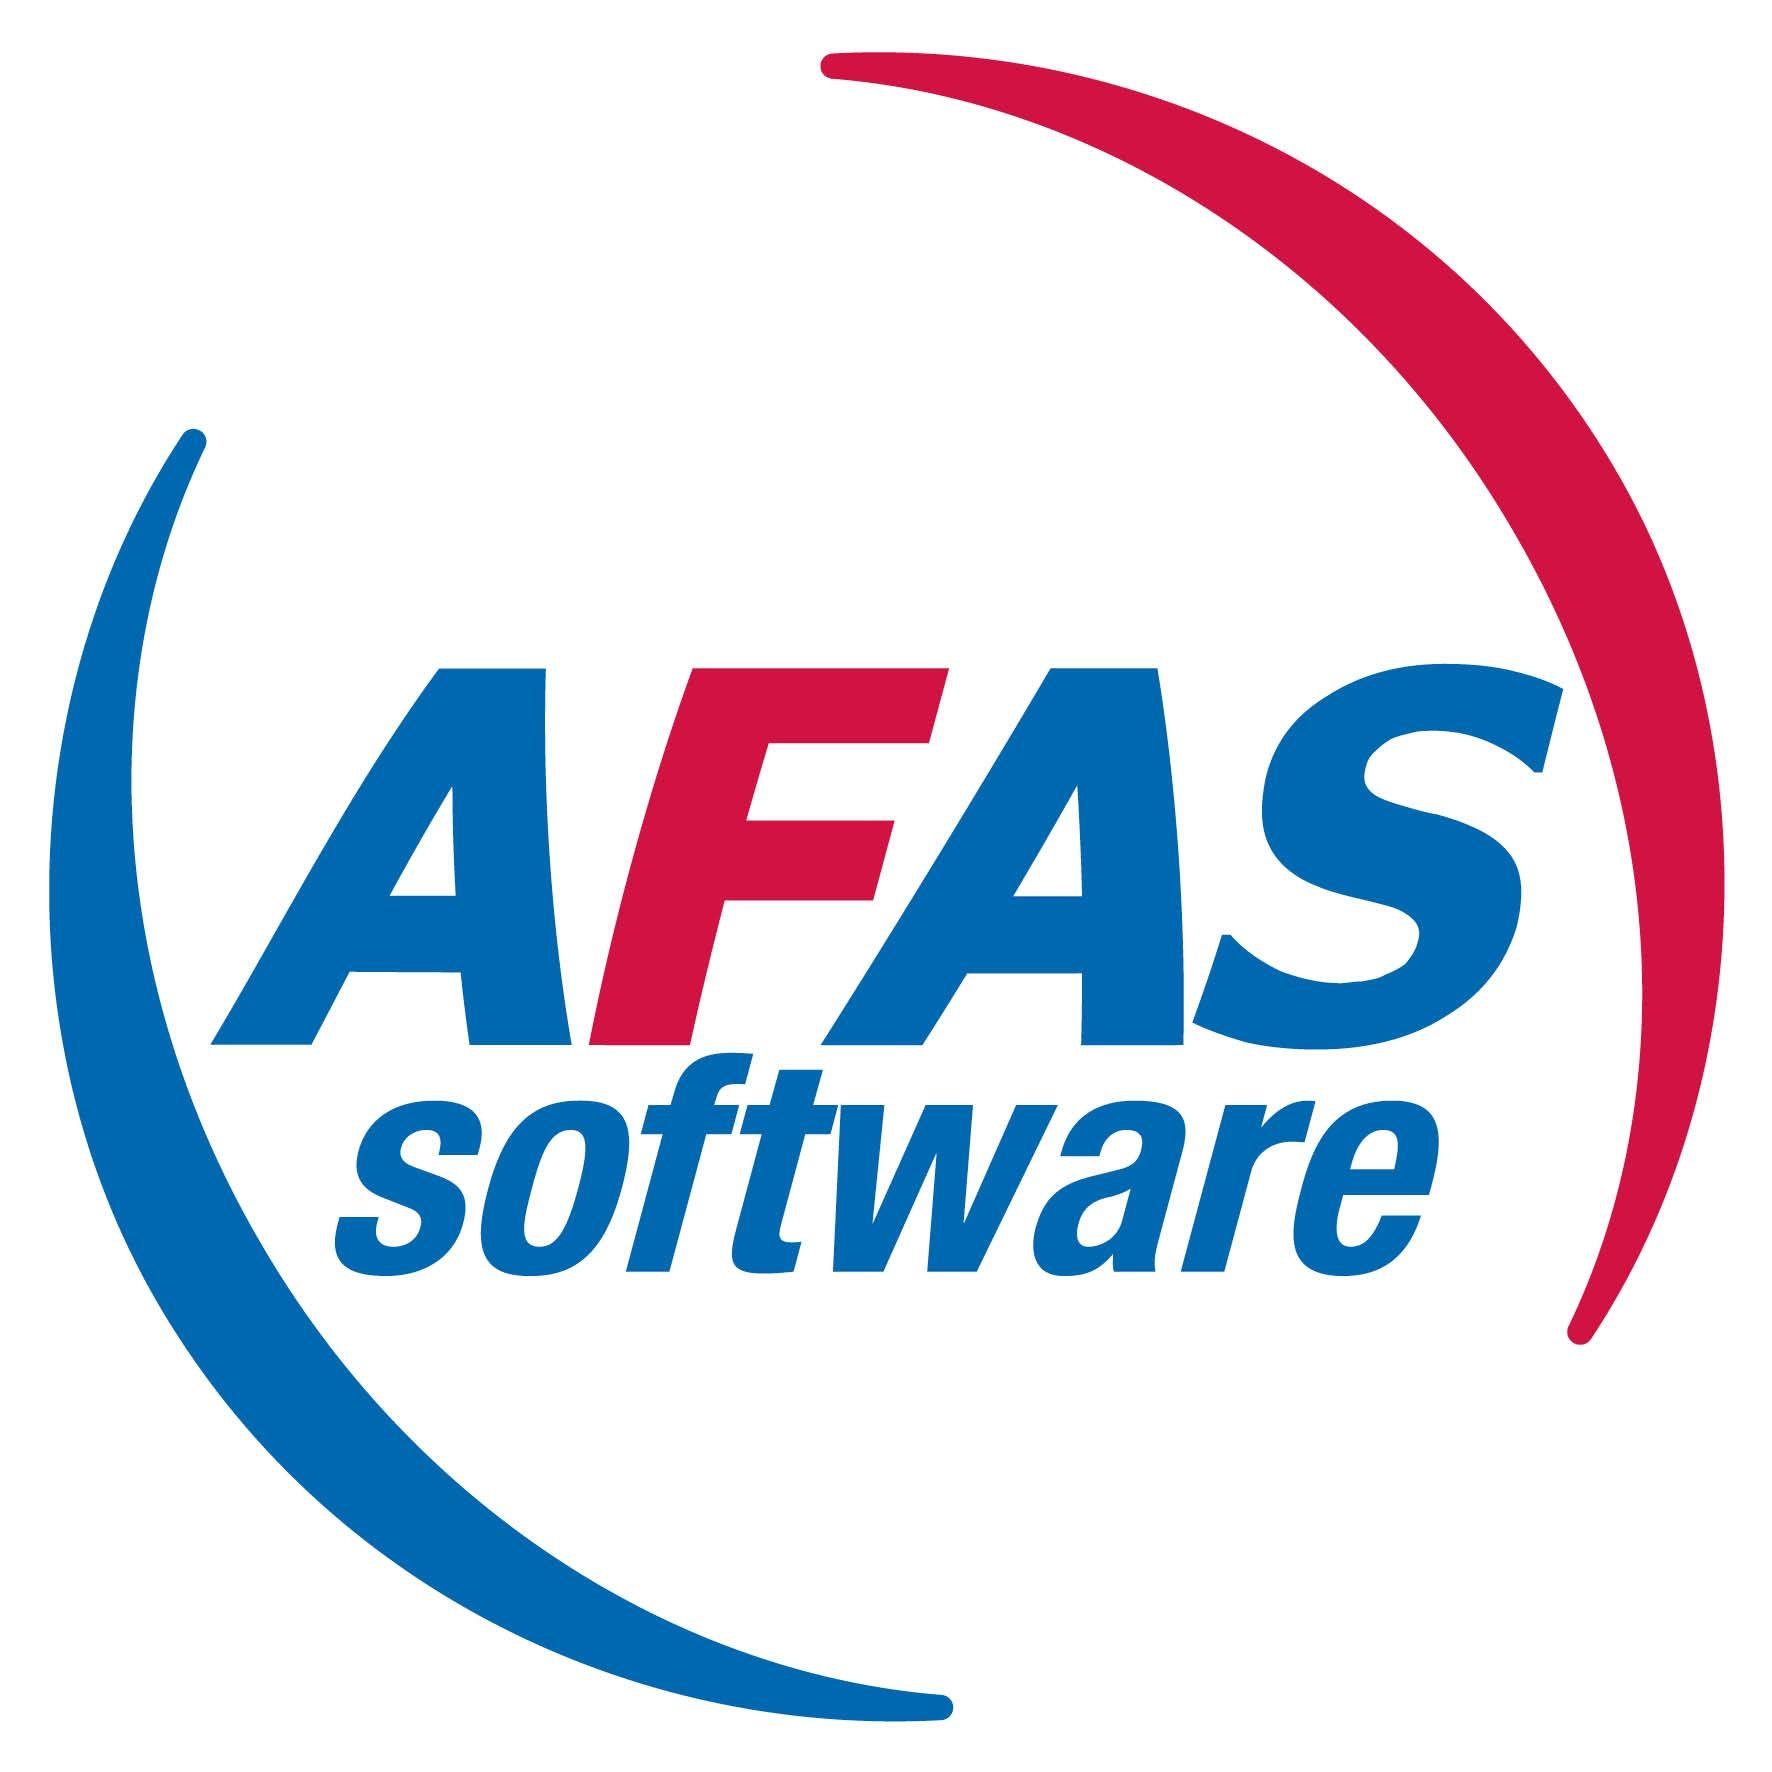 Fantasie letters Software, Logos